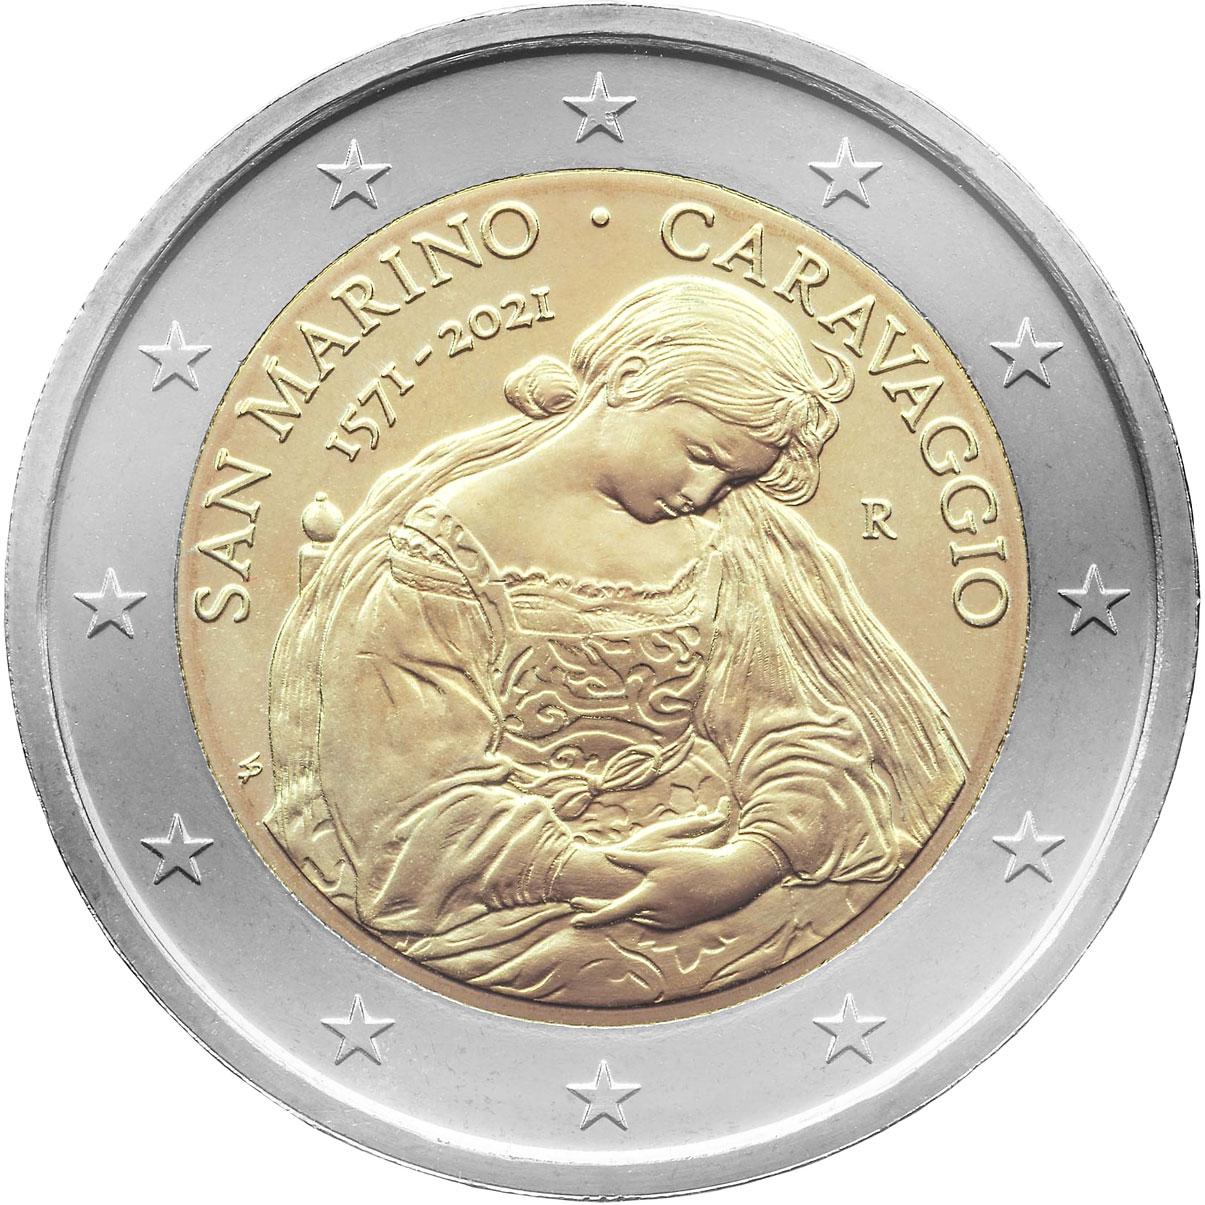 Сан-Марино монета 2 евро Караваджо, реверс